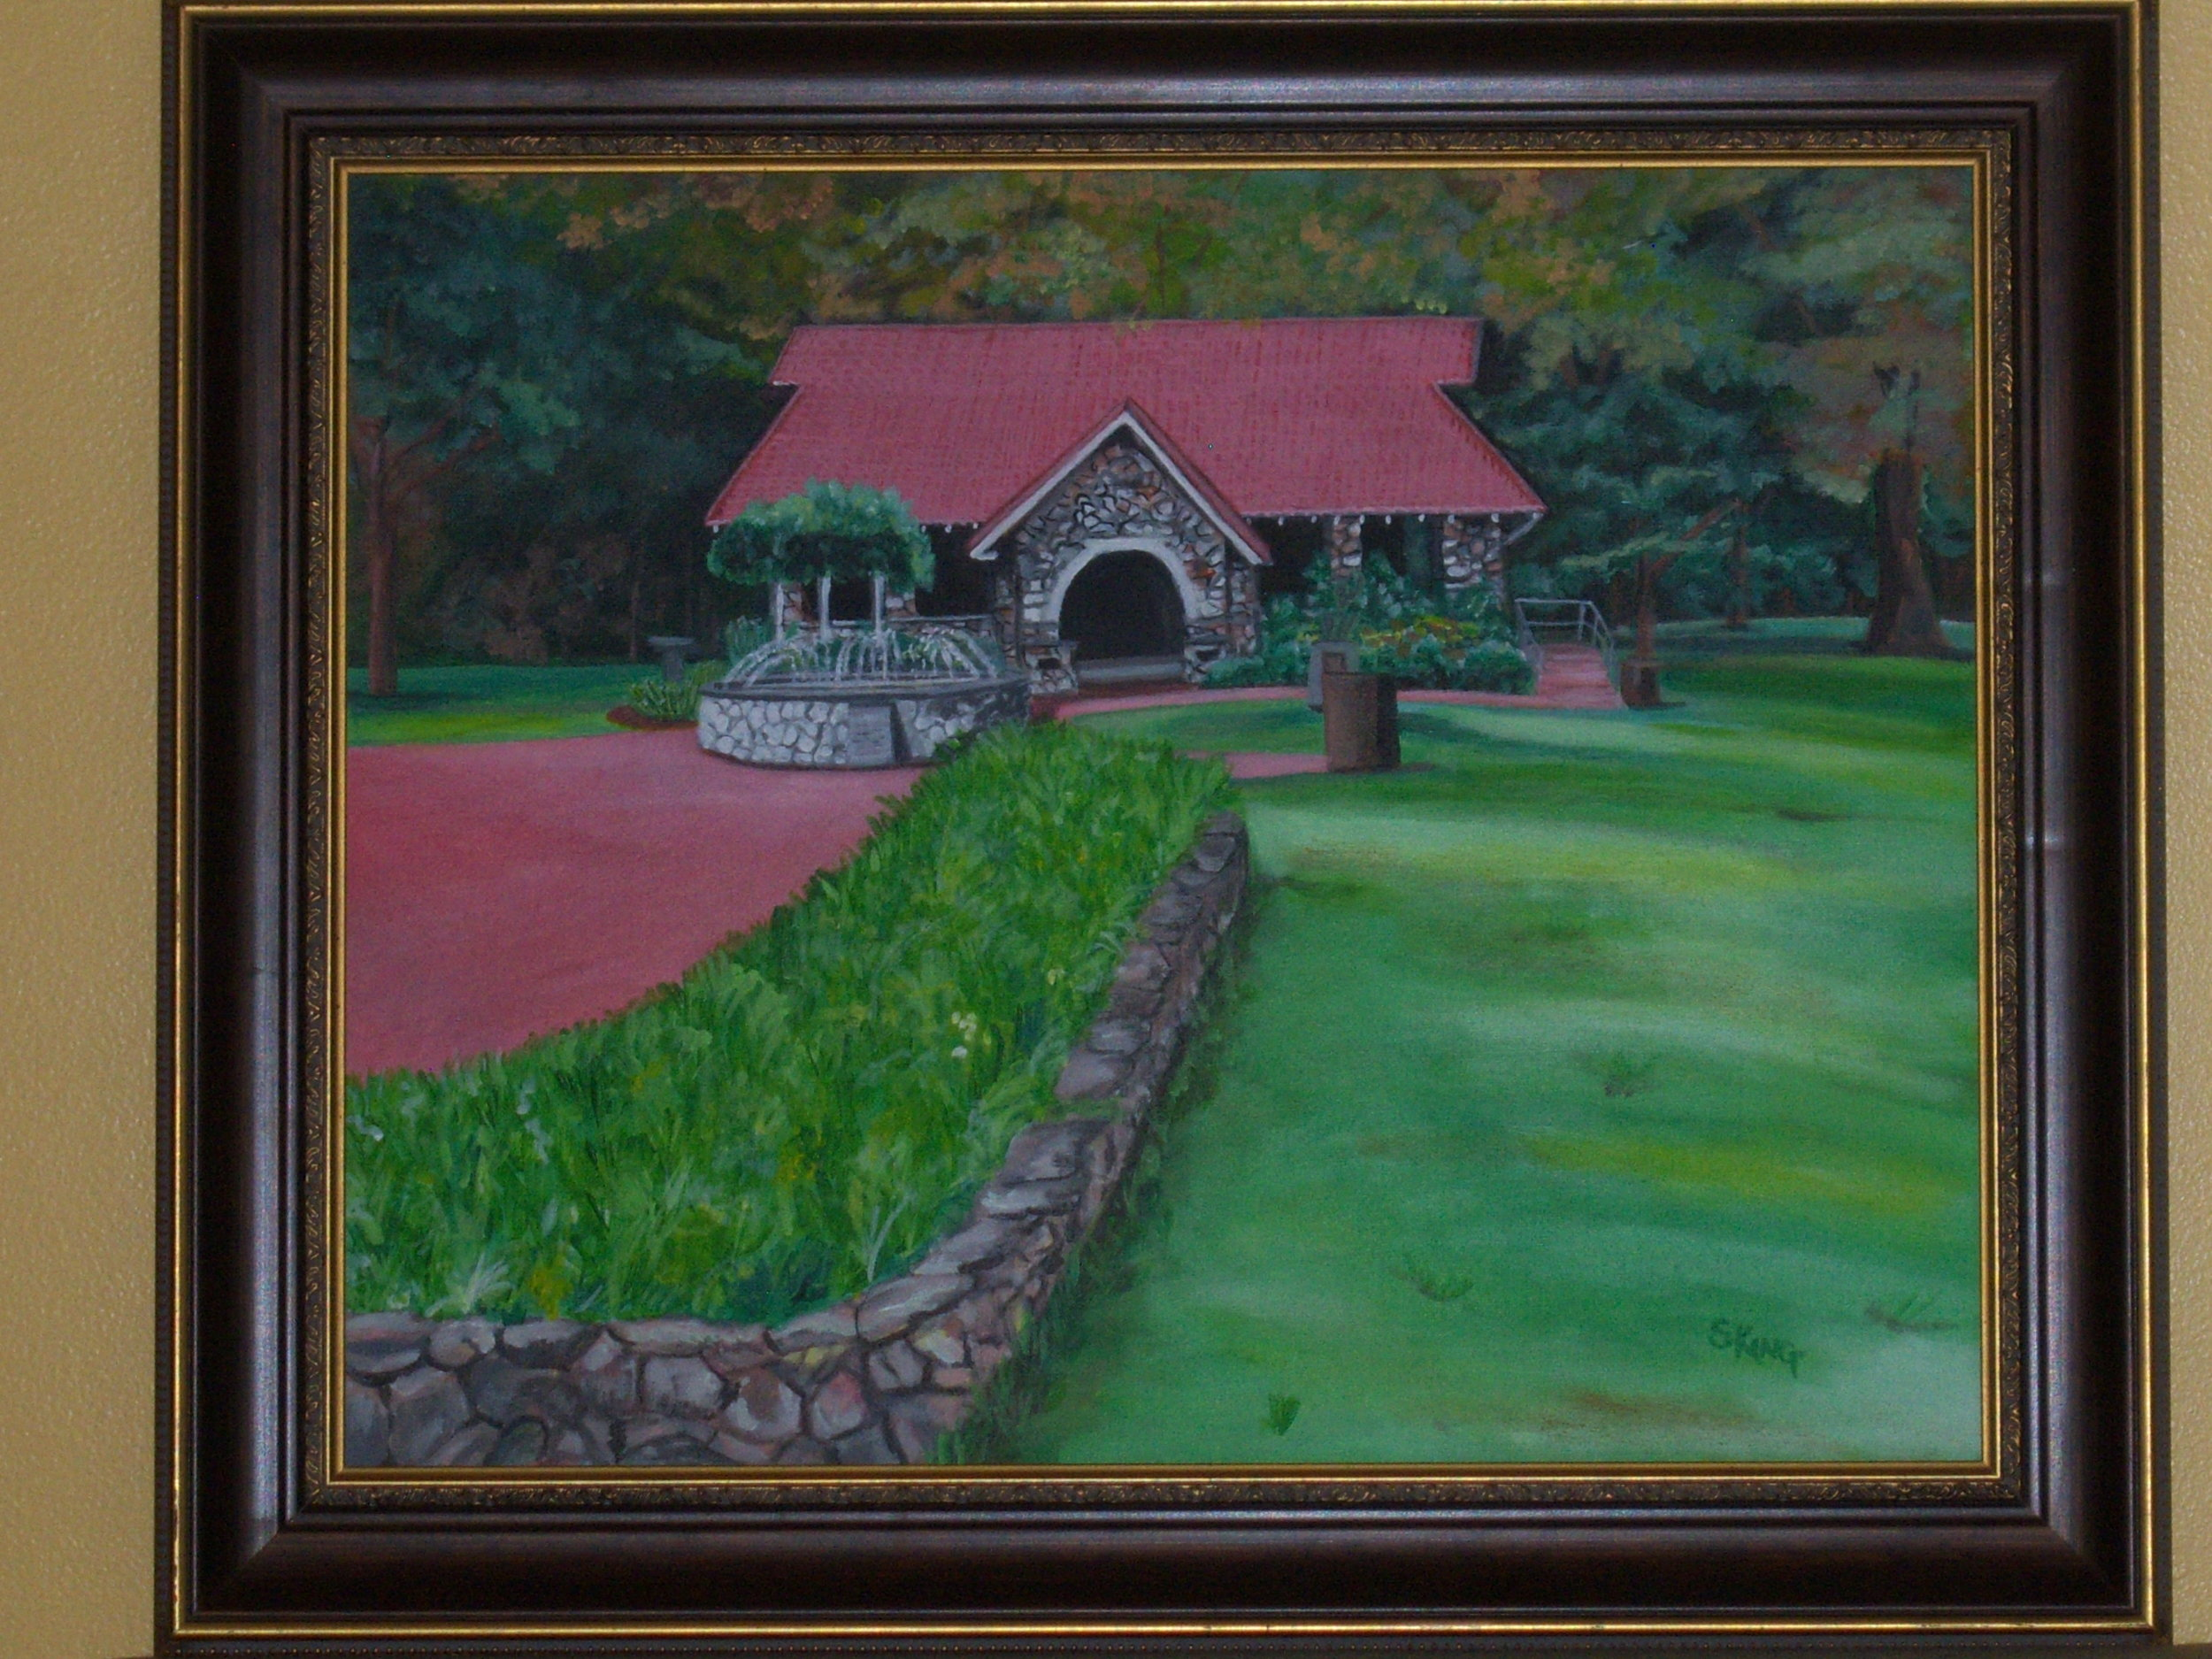 SusanKing_GreeleyParkStoneHouse-NashuaNH-16x20-Acrylics-$400.JPG